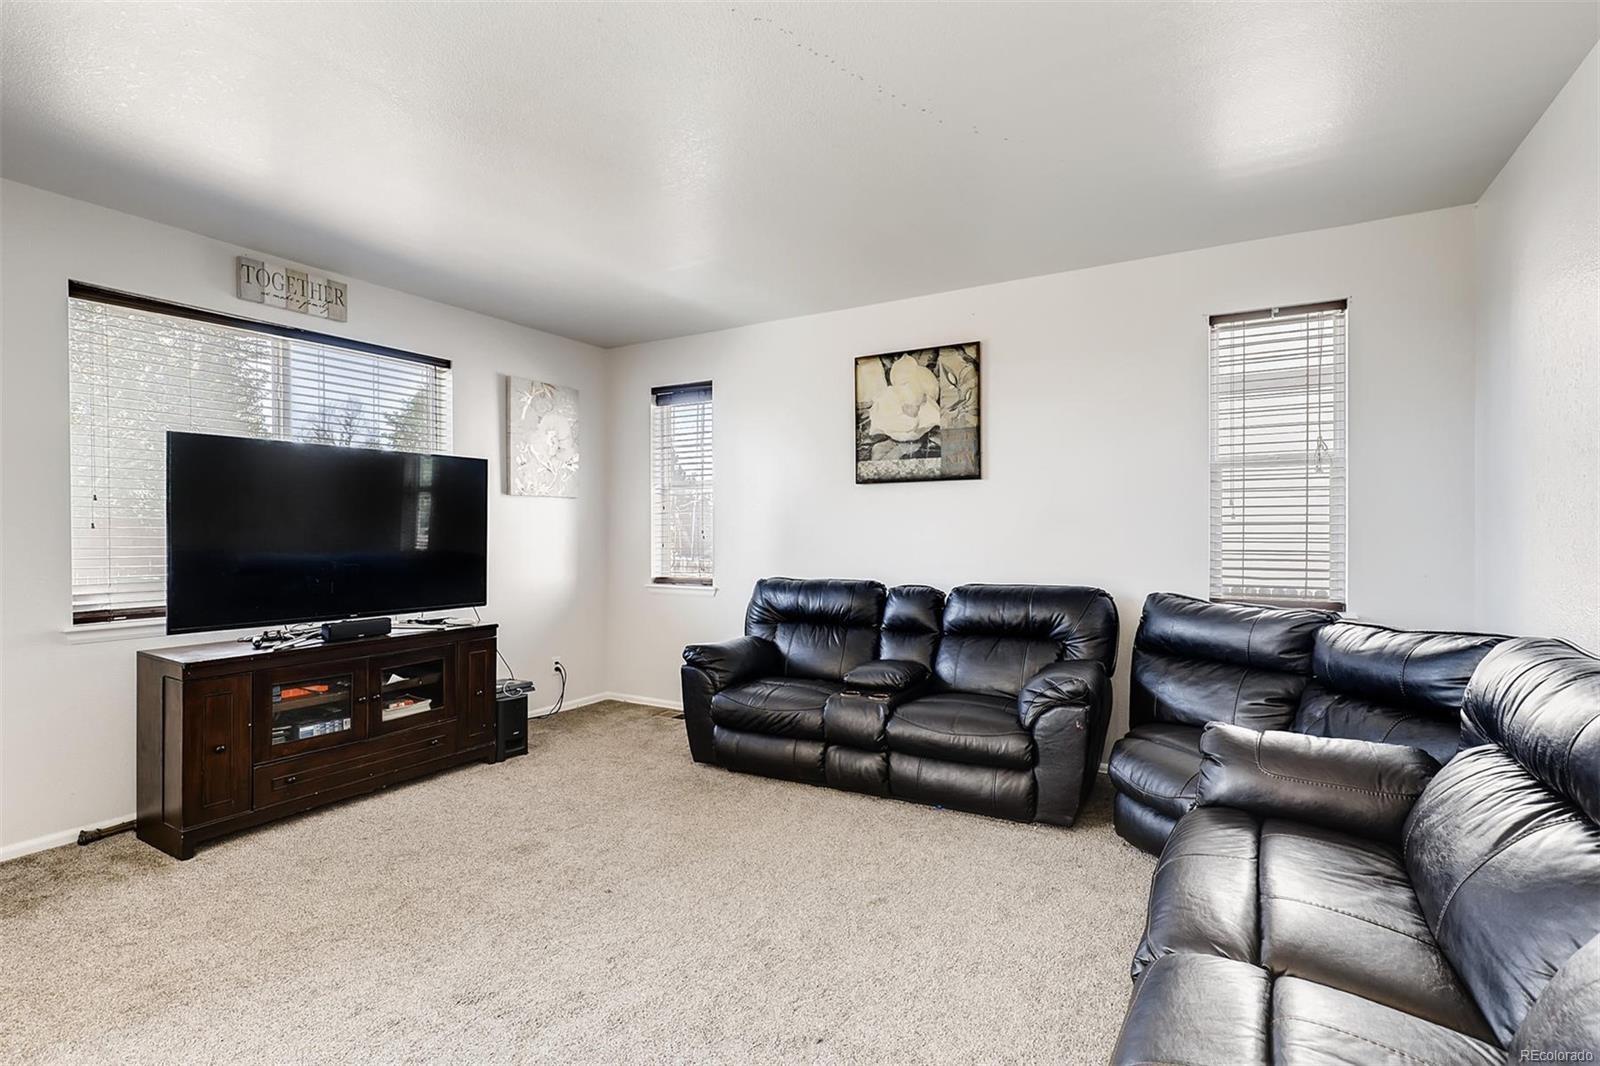 MLS# 3724639 - 1 - 7780  E 129th Place, Thornton, CO 80602